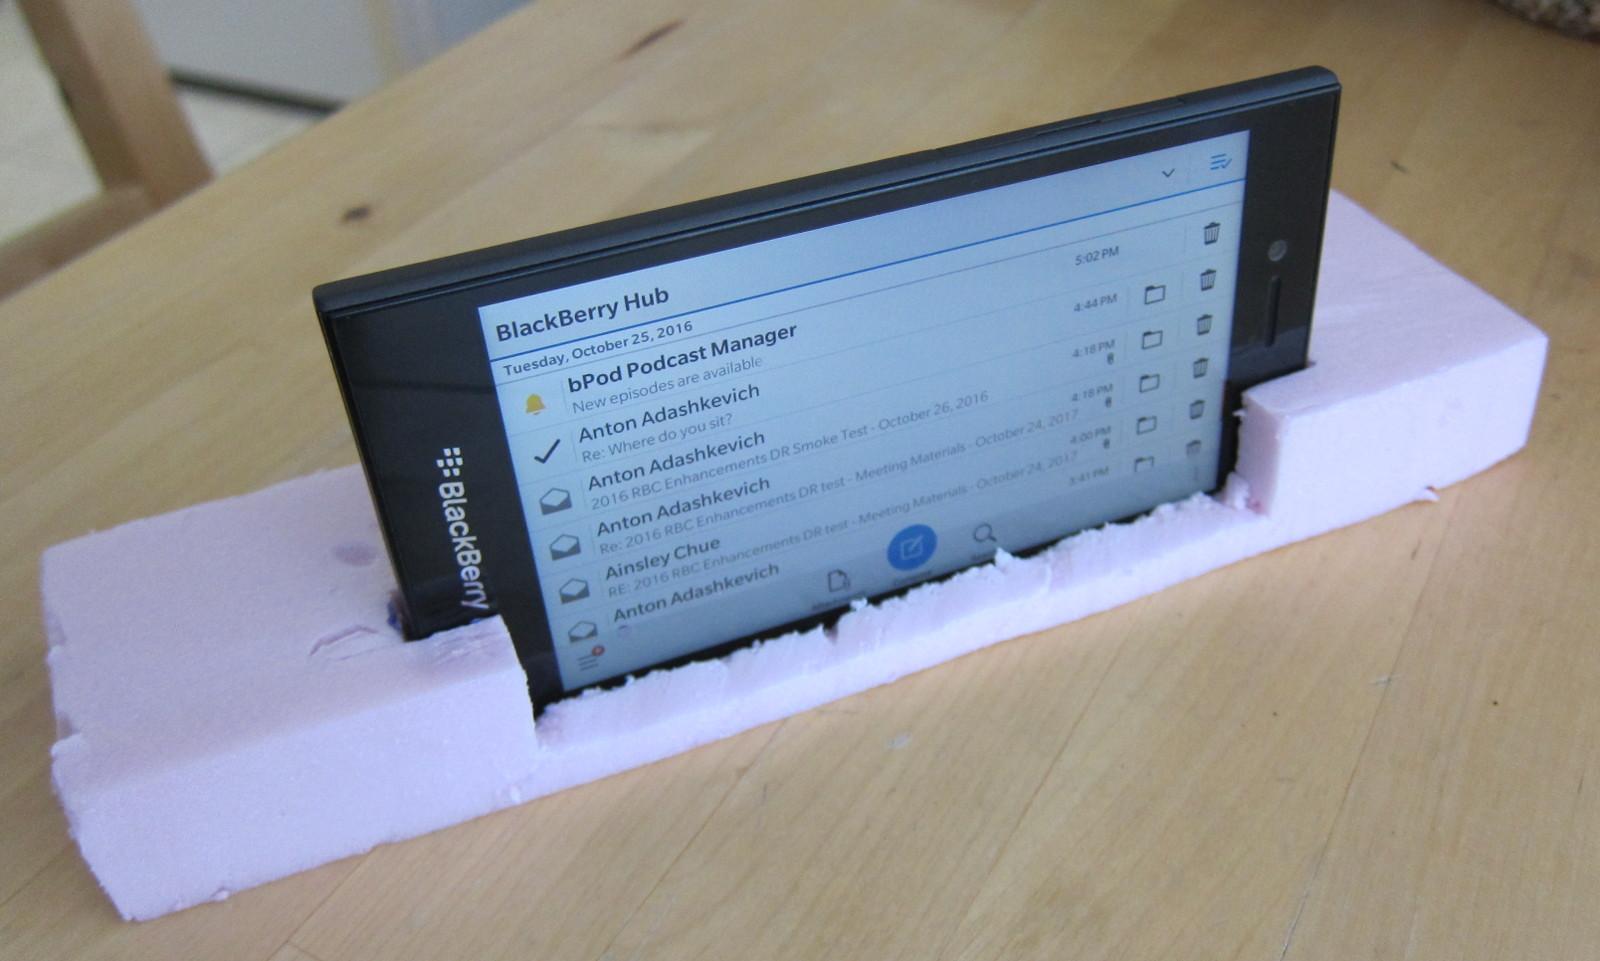 Foam Prototype of Mobile Phone Mount